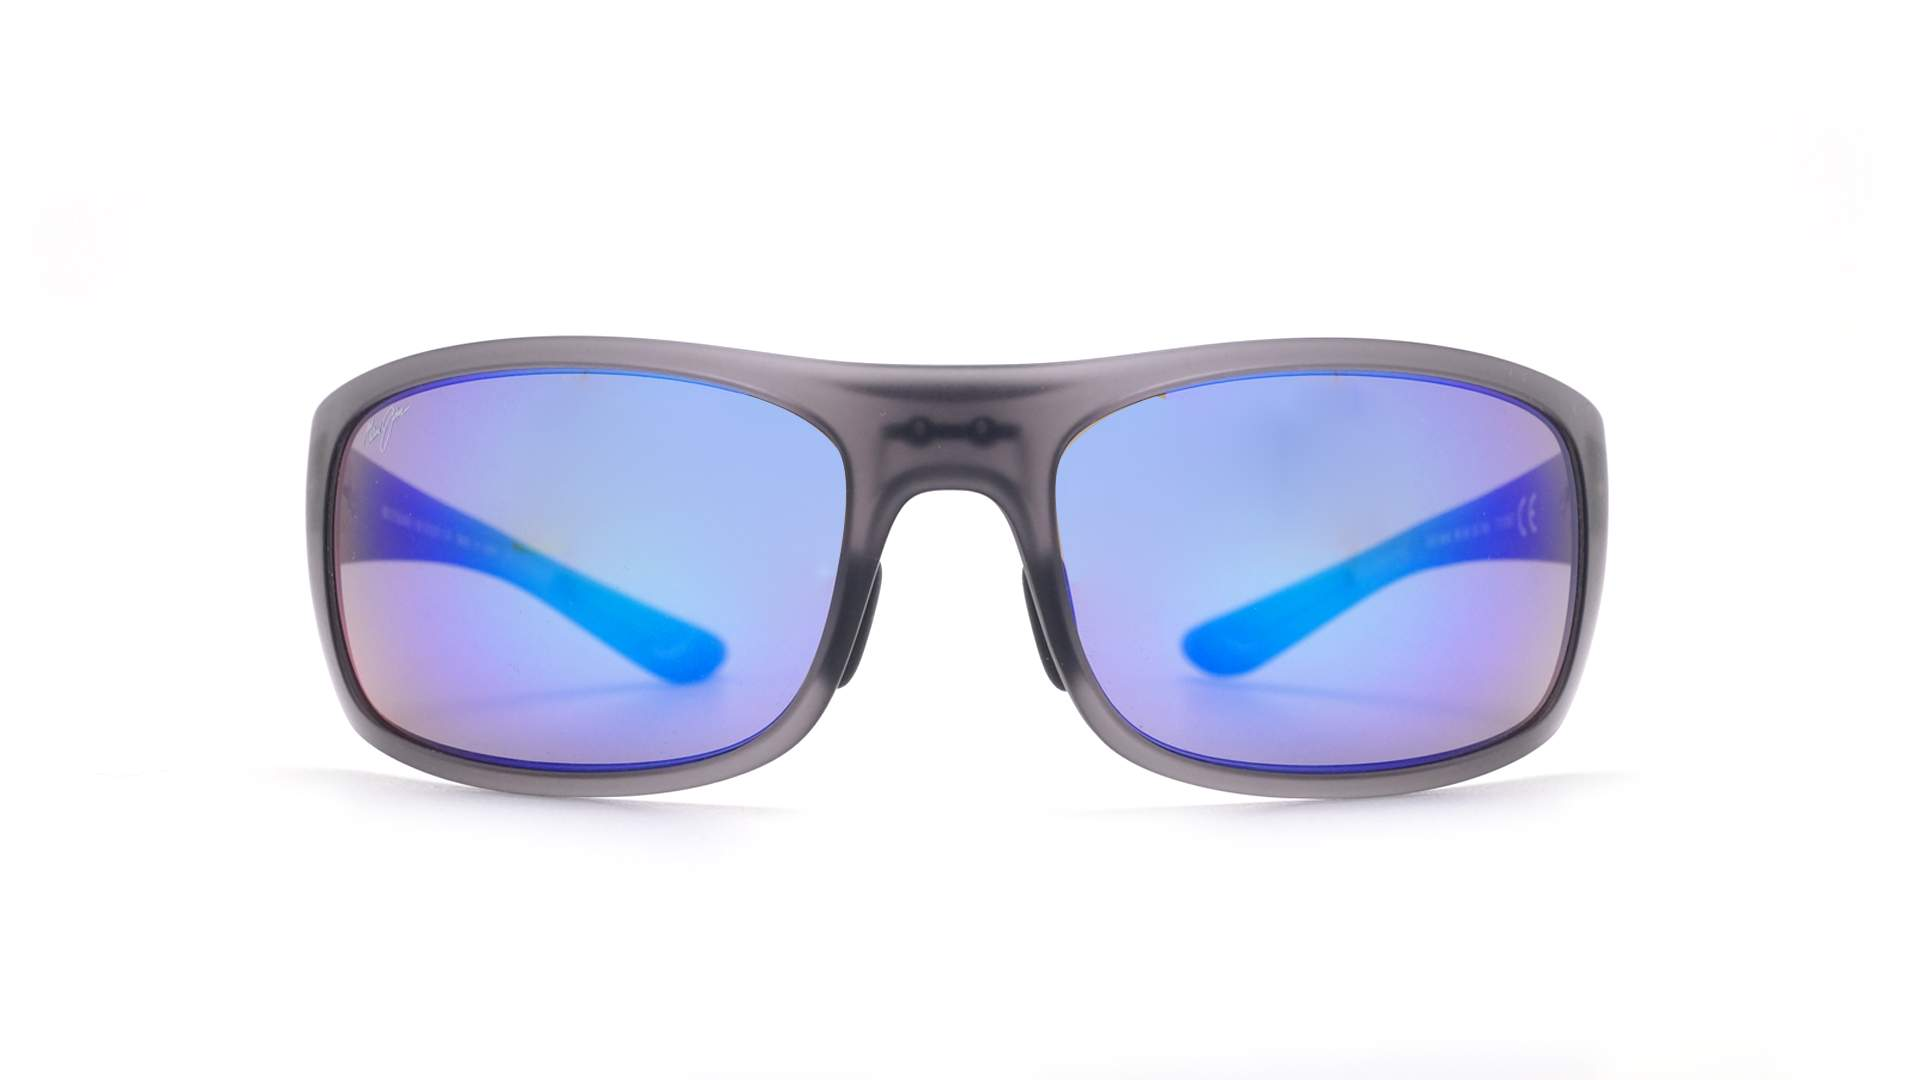 86fd9e4aa2 Sunglasses Maui Jim Big wave Clear Matte Maui pure B44011M Polarized  Gradient